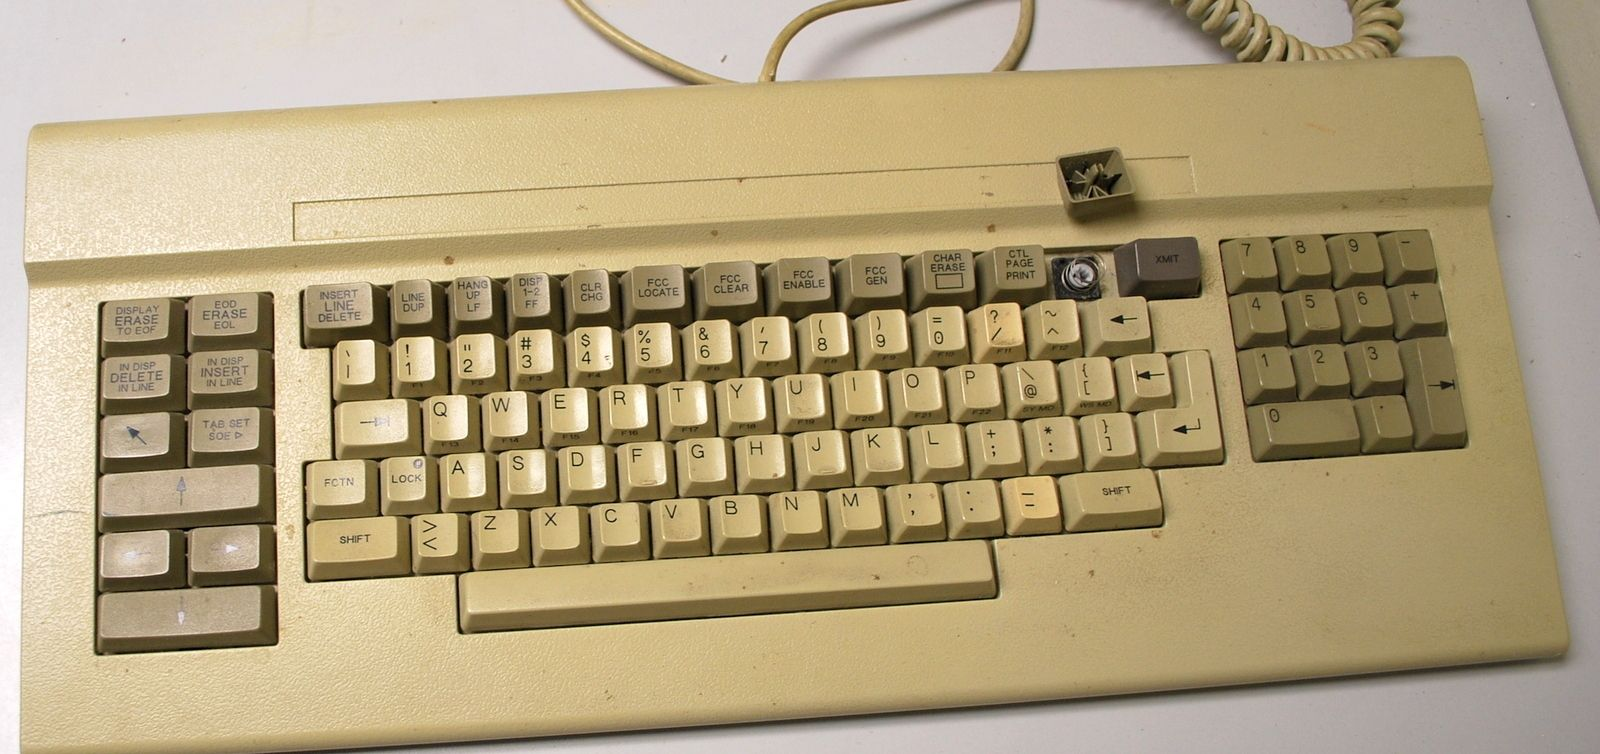 Vintage Terminal Keyboard Made In Usa F 4725 25 Keyboard How To Make Vintage